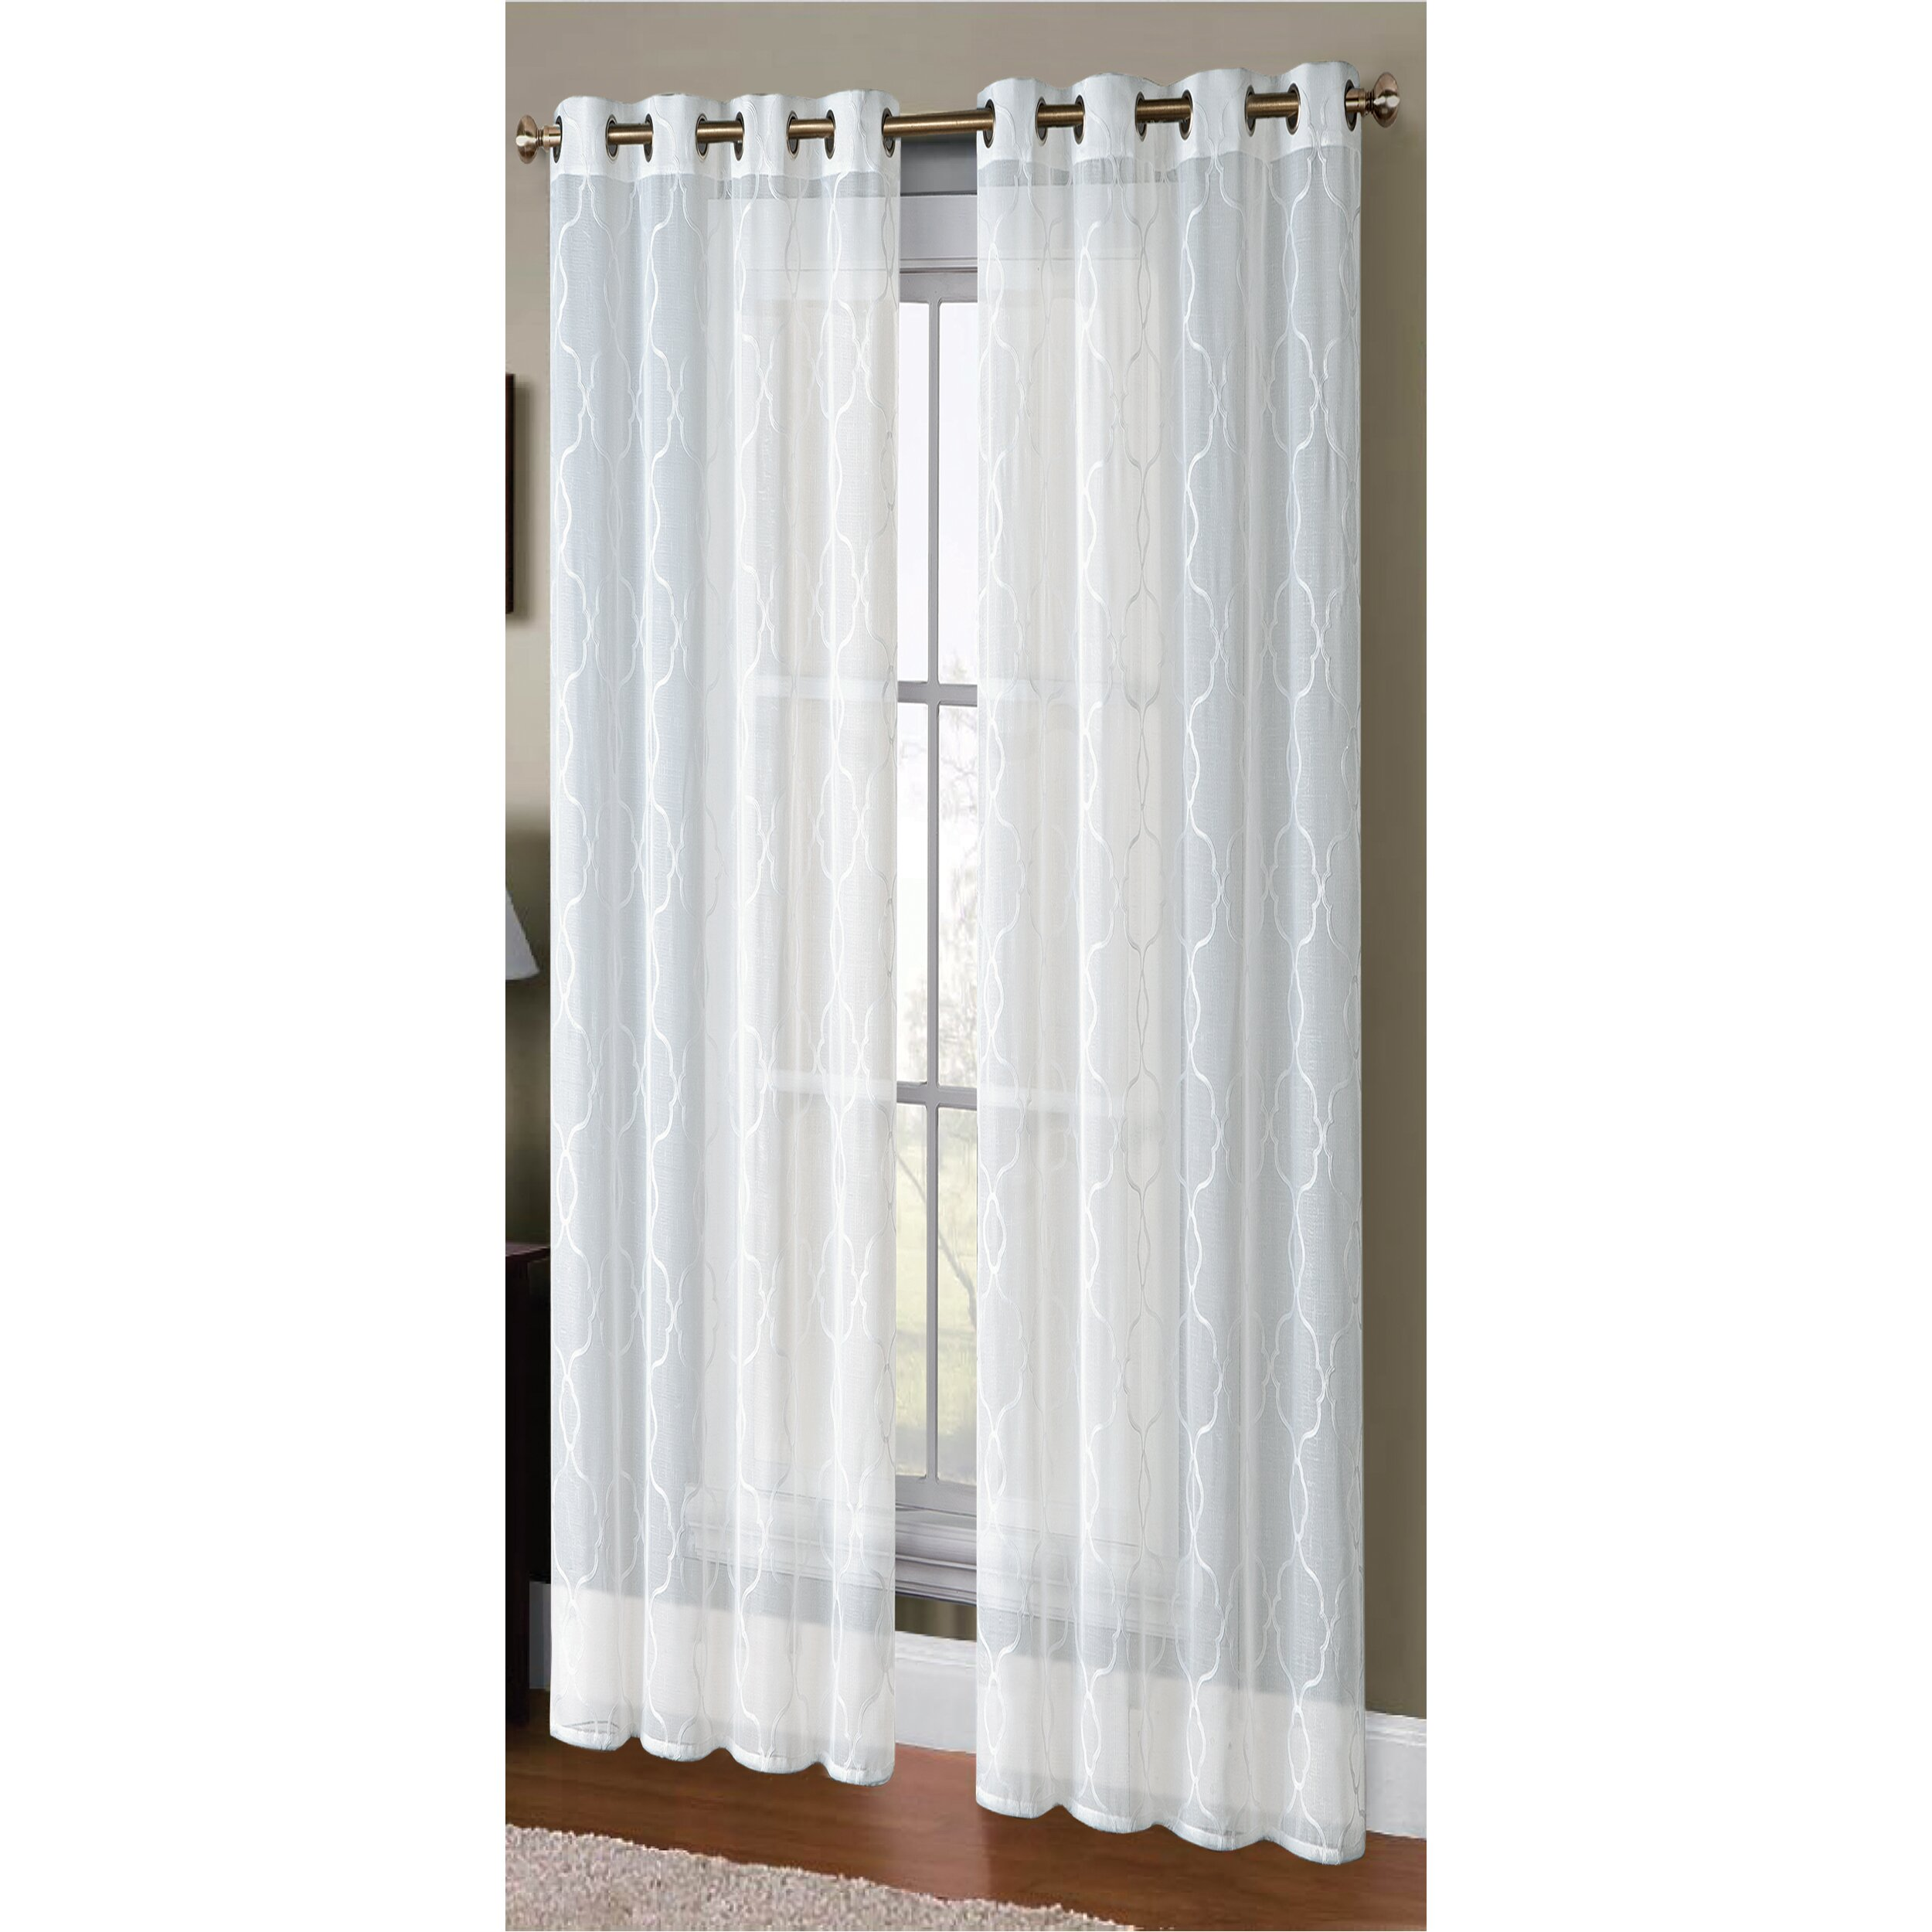 Alcott Hill Knollwood Boho Embroided Sheer Curtain Panels Reviews Wayfair